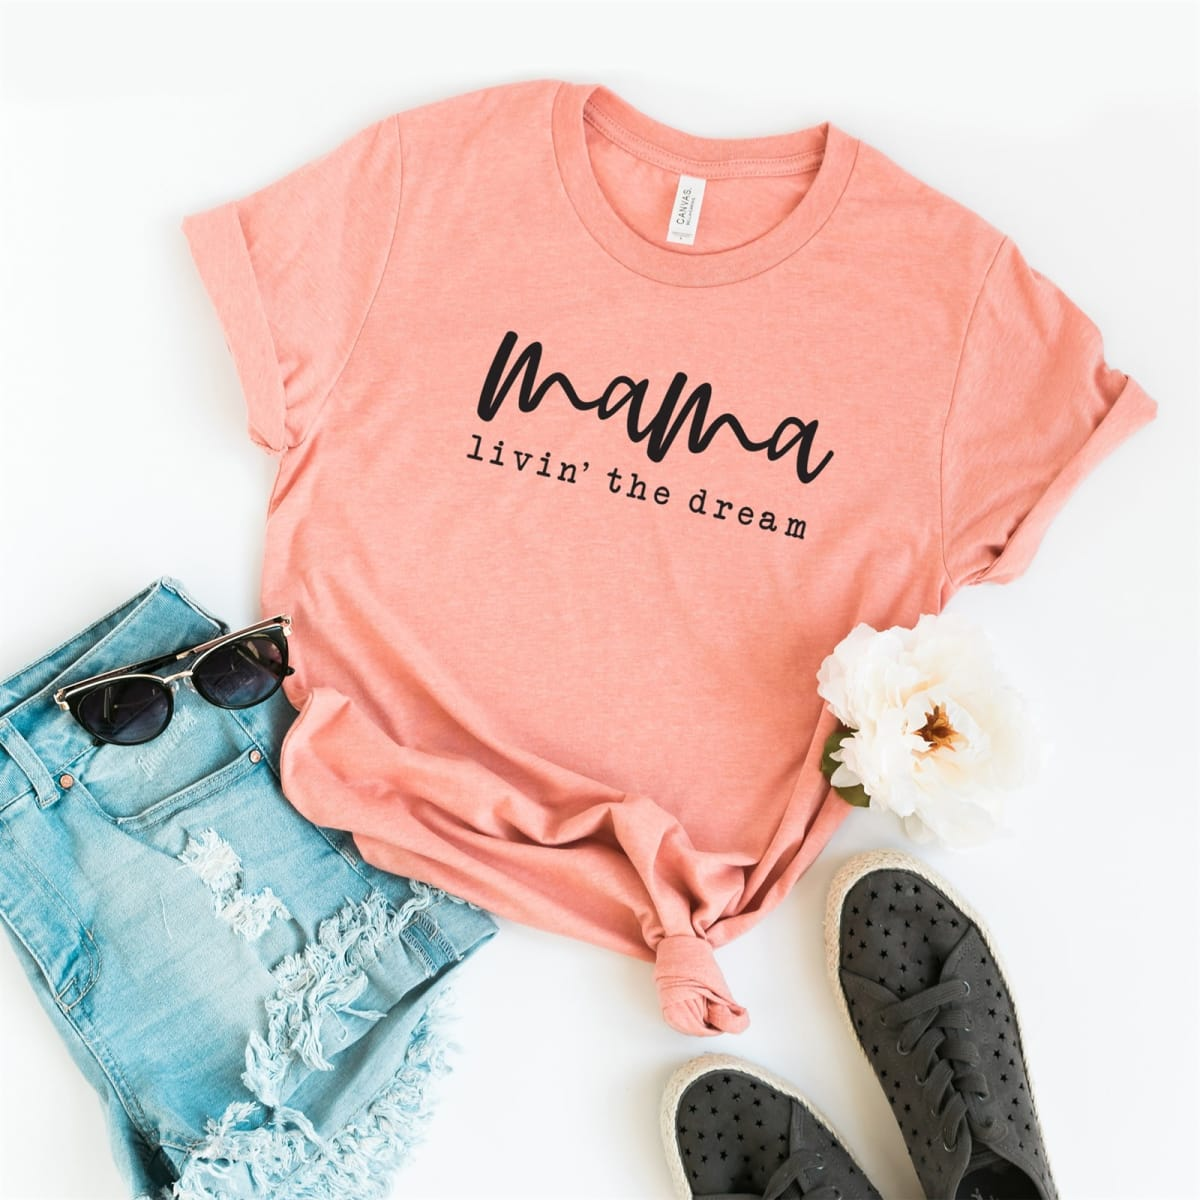 Mom Life T-shirts